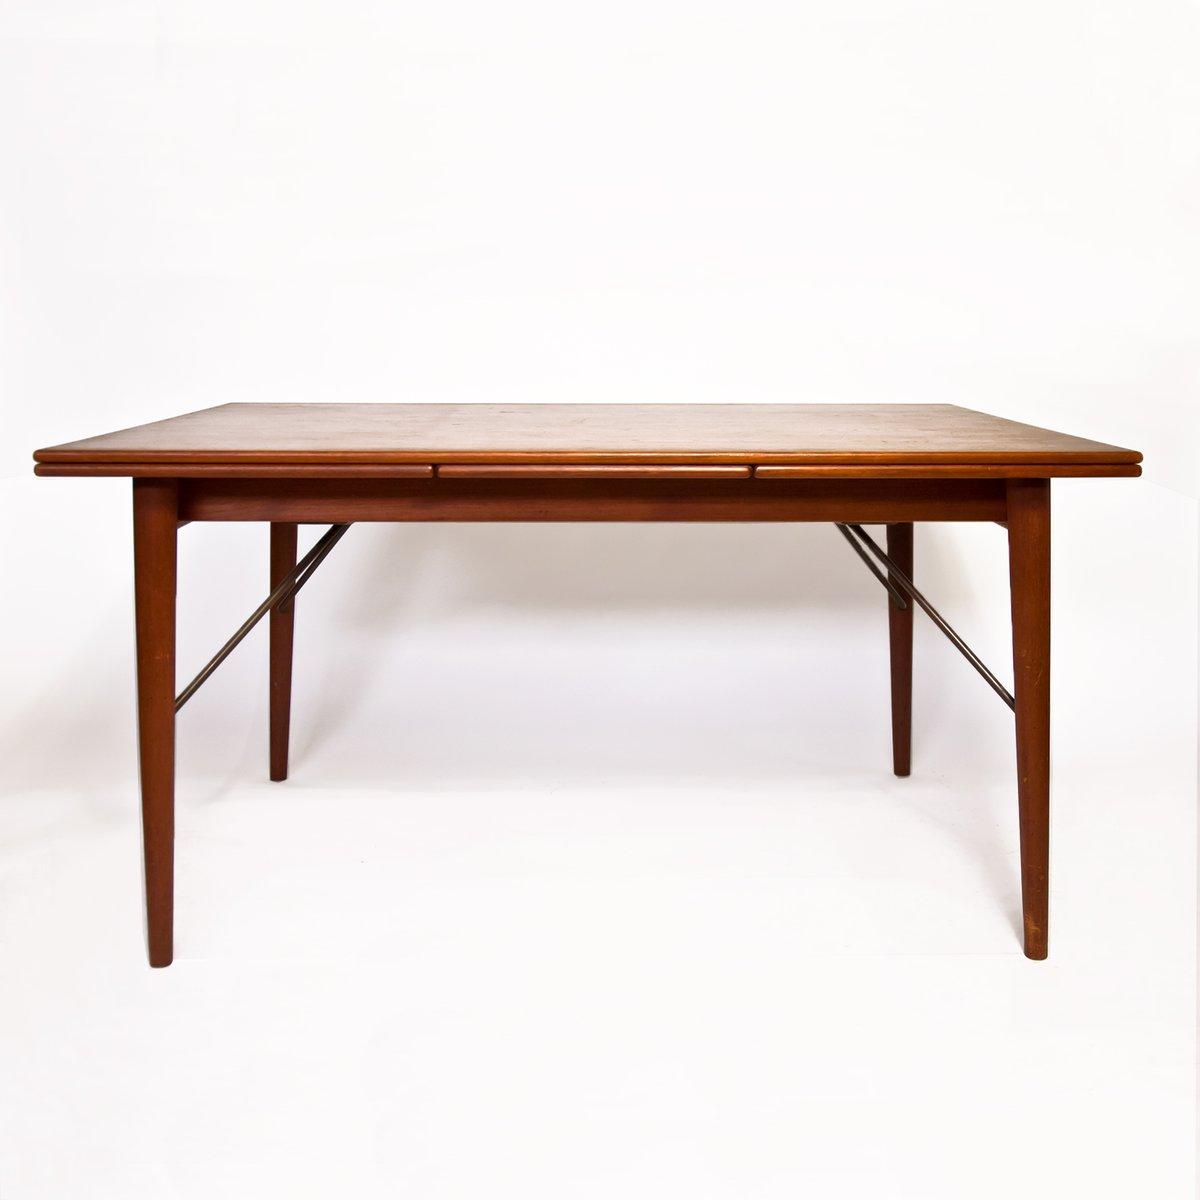 Scandinavian dining table by peter hvidt orla m lgaard nielsen for s borg m belfabrik for sale - Dining table scandinavian ...